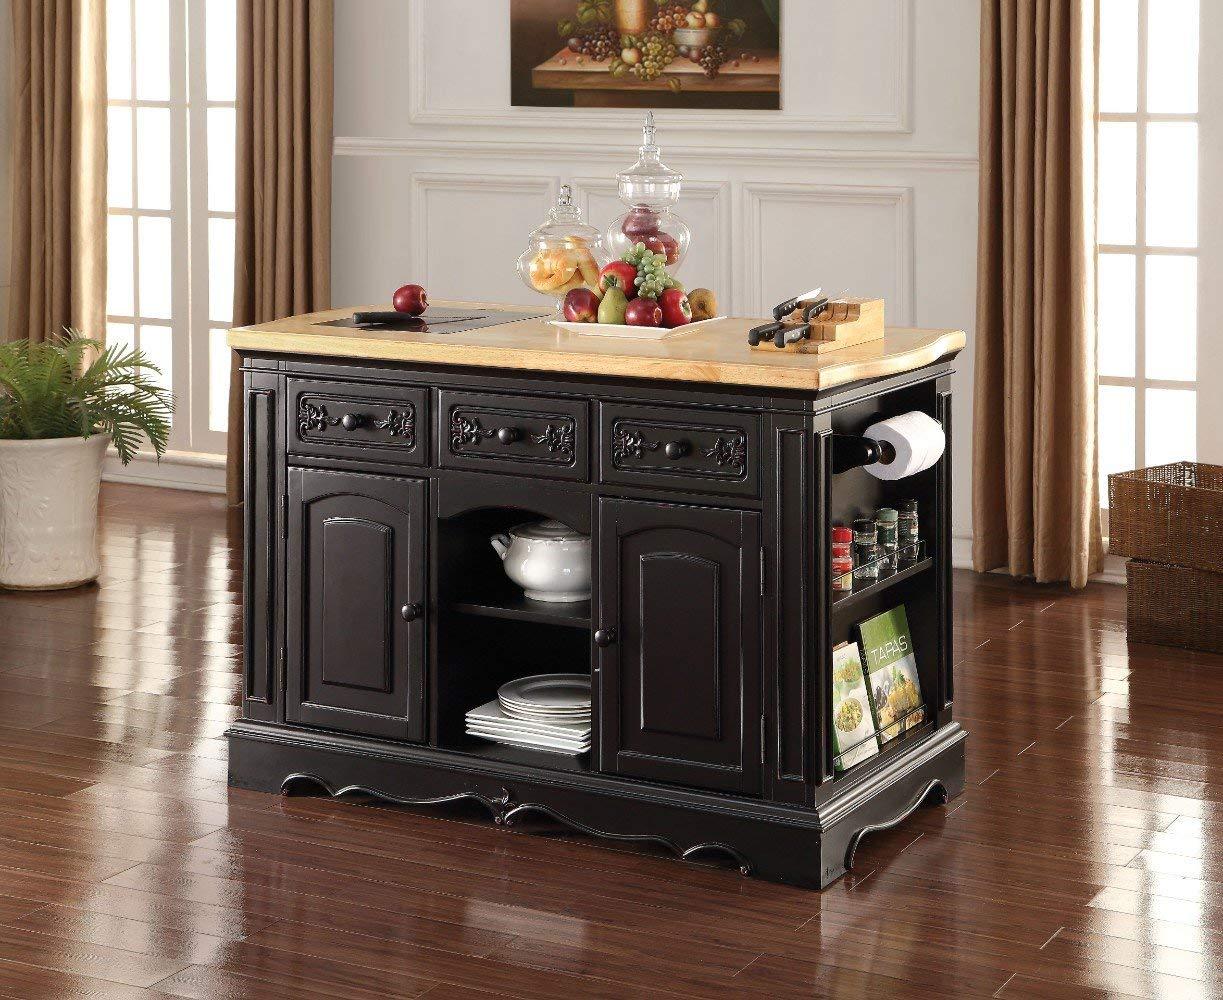 Get Quotations Benzara Bm163020 Wooden Kitchen Cabinet Black